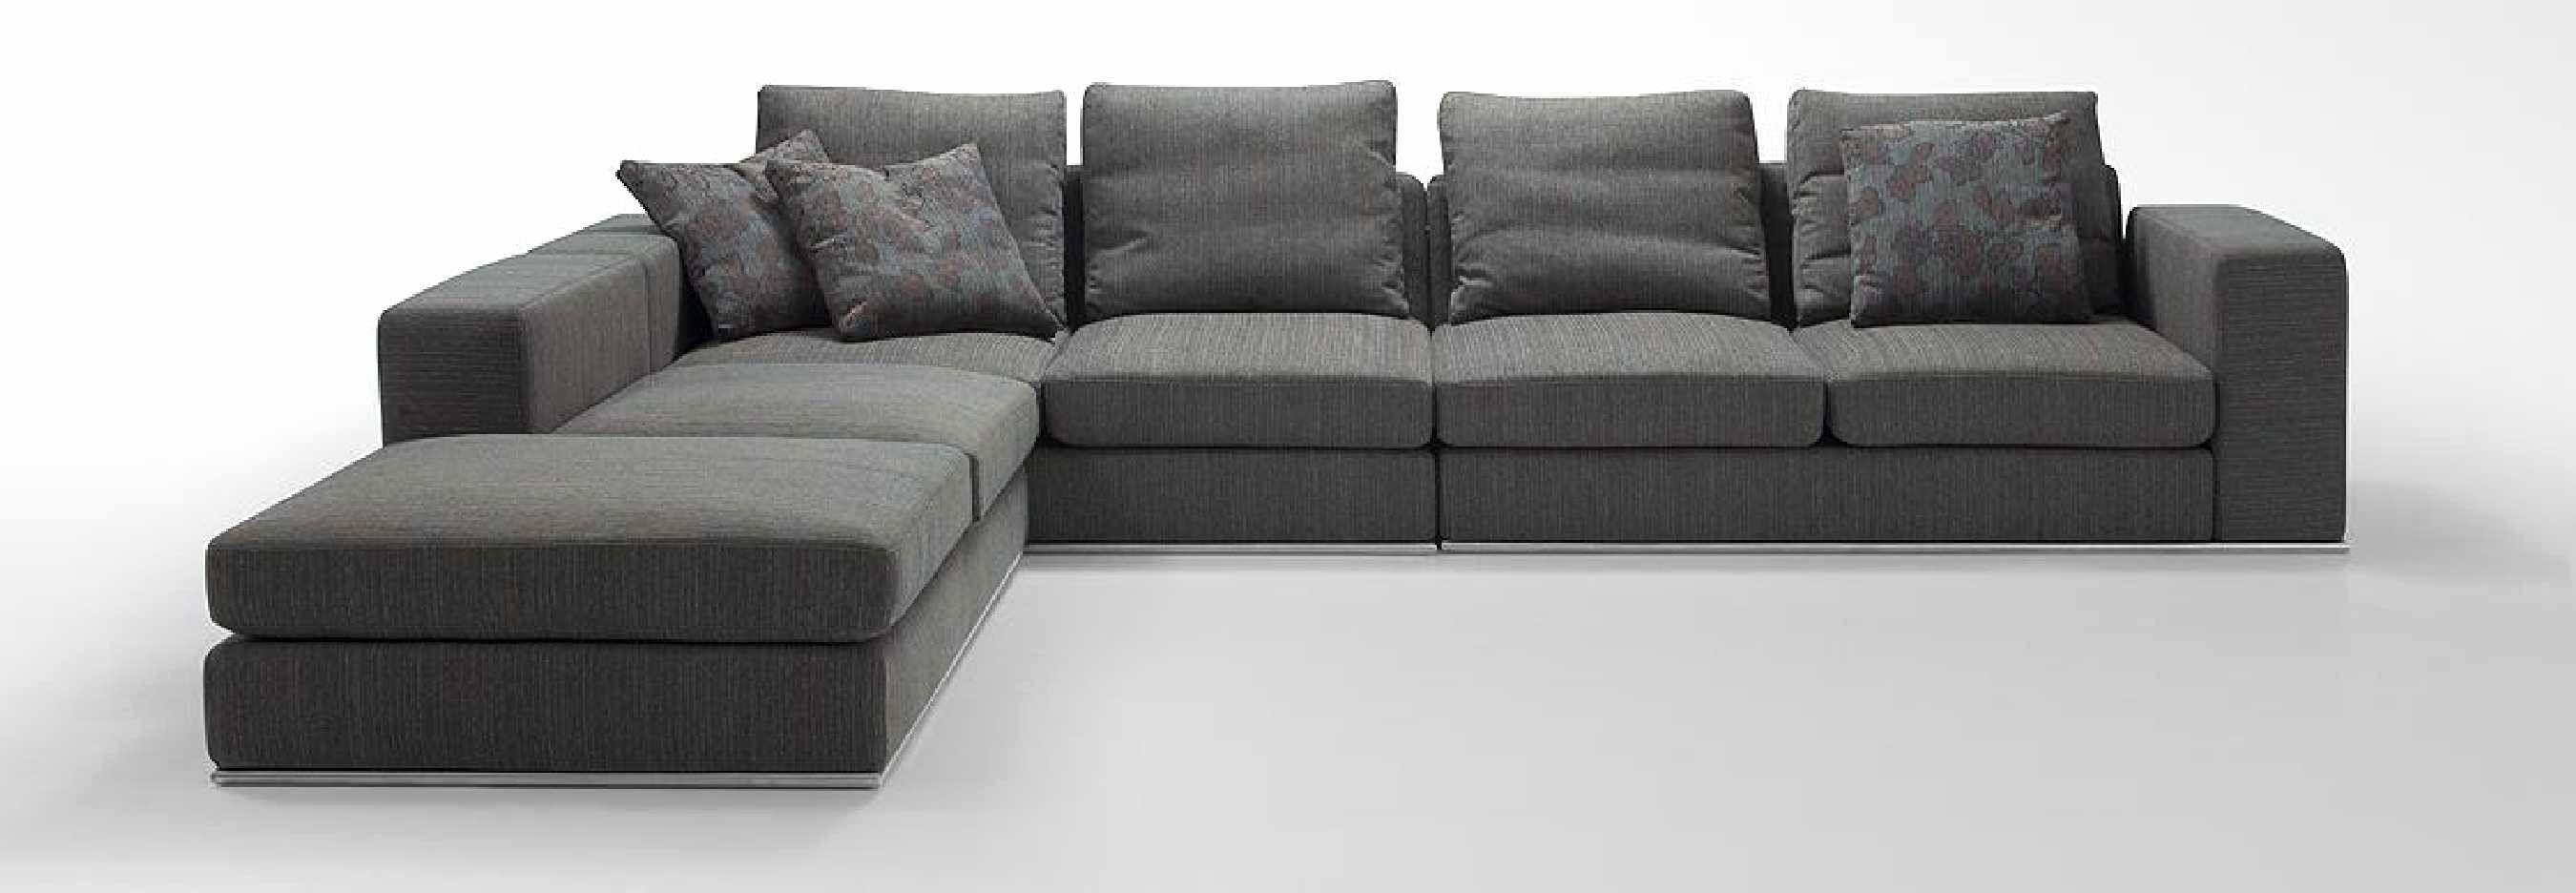 Elegant Modern sofa Grey Graphics Modern sofa Grey Fresh Appealing L